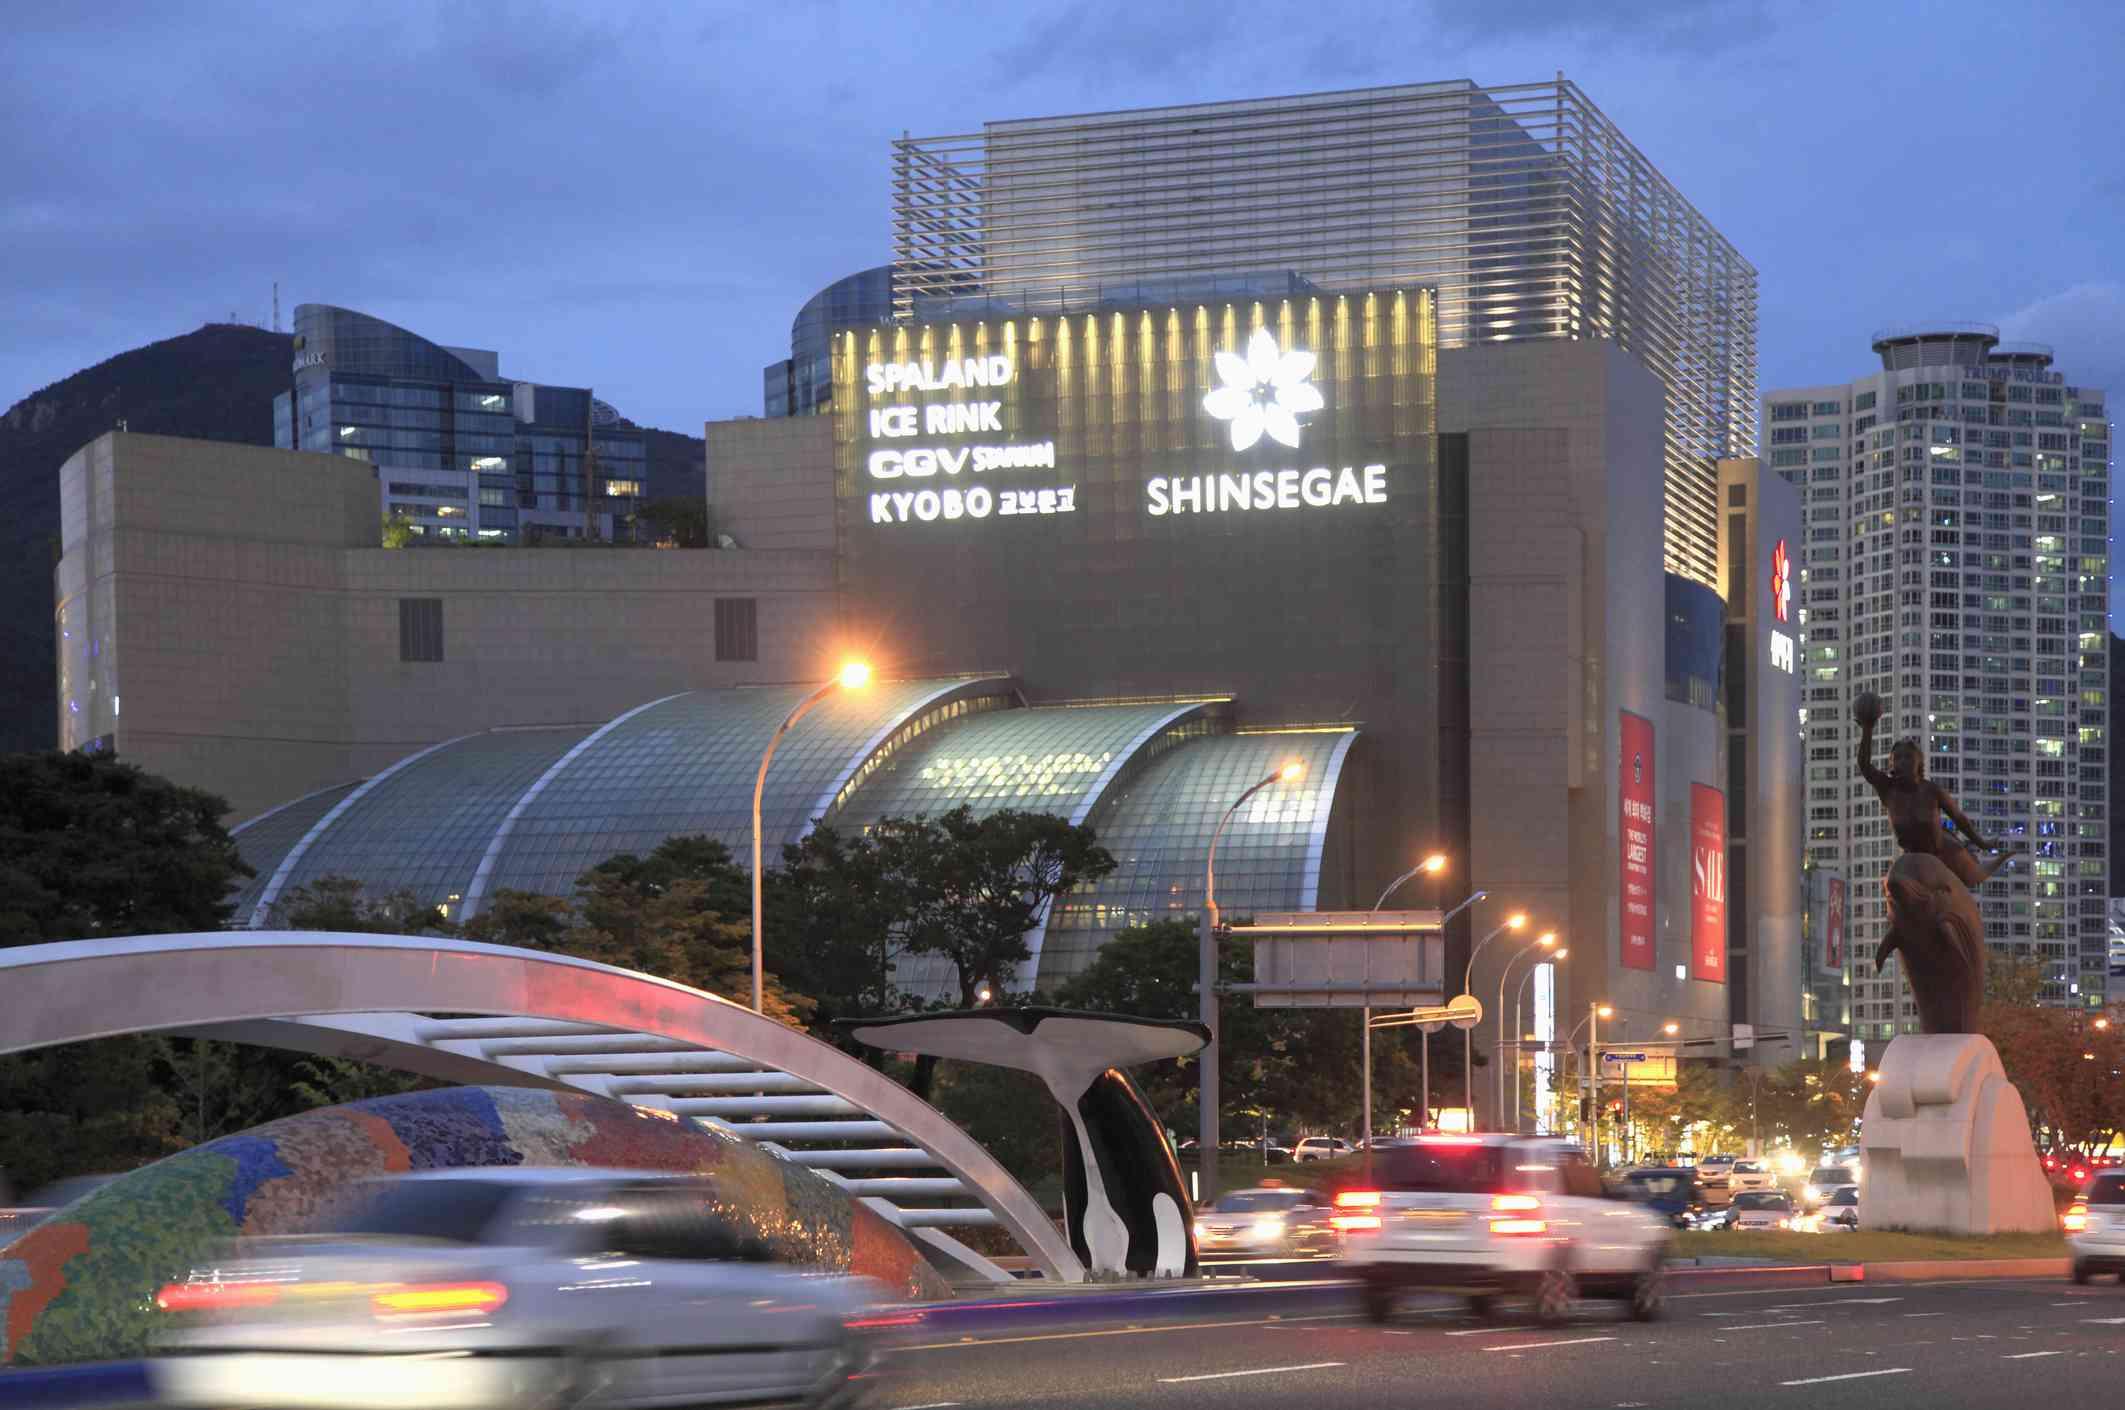 South Korea, Busan, Centum City, Shinsegae department store